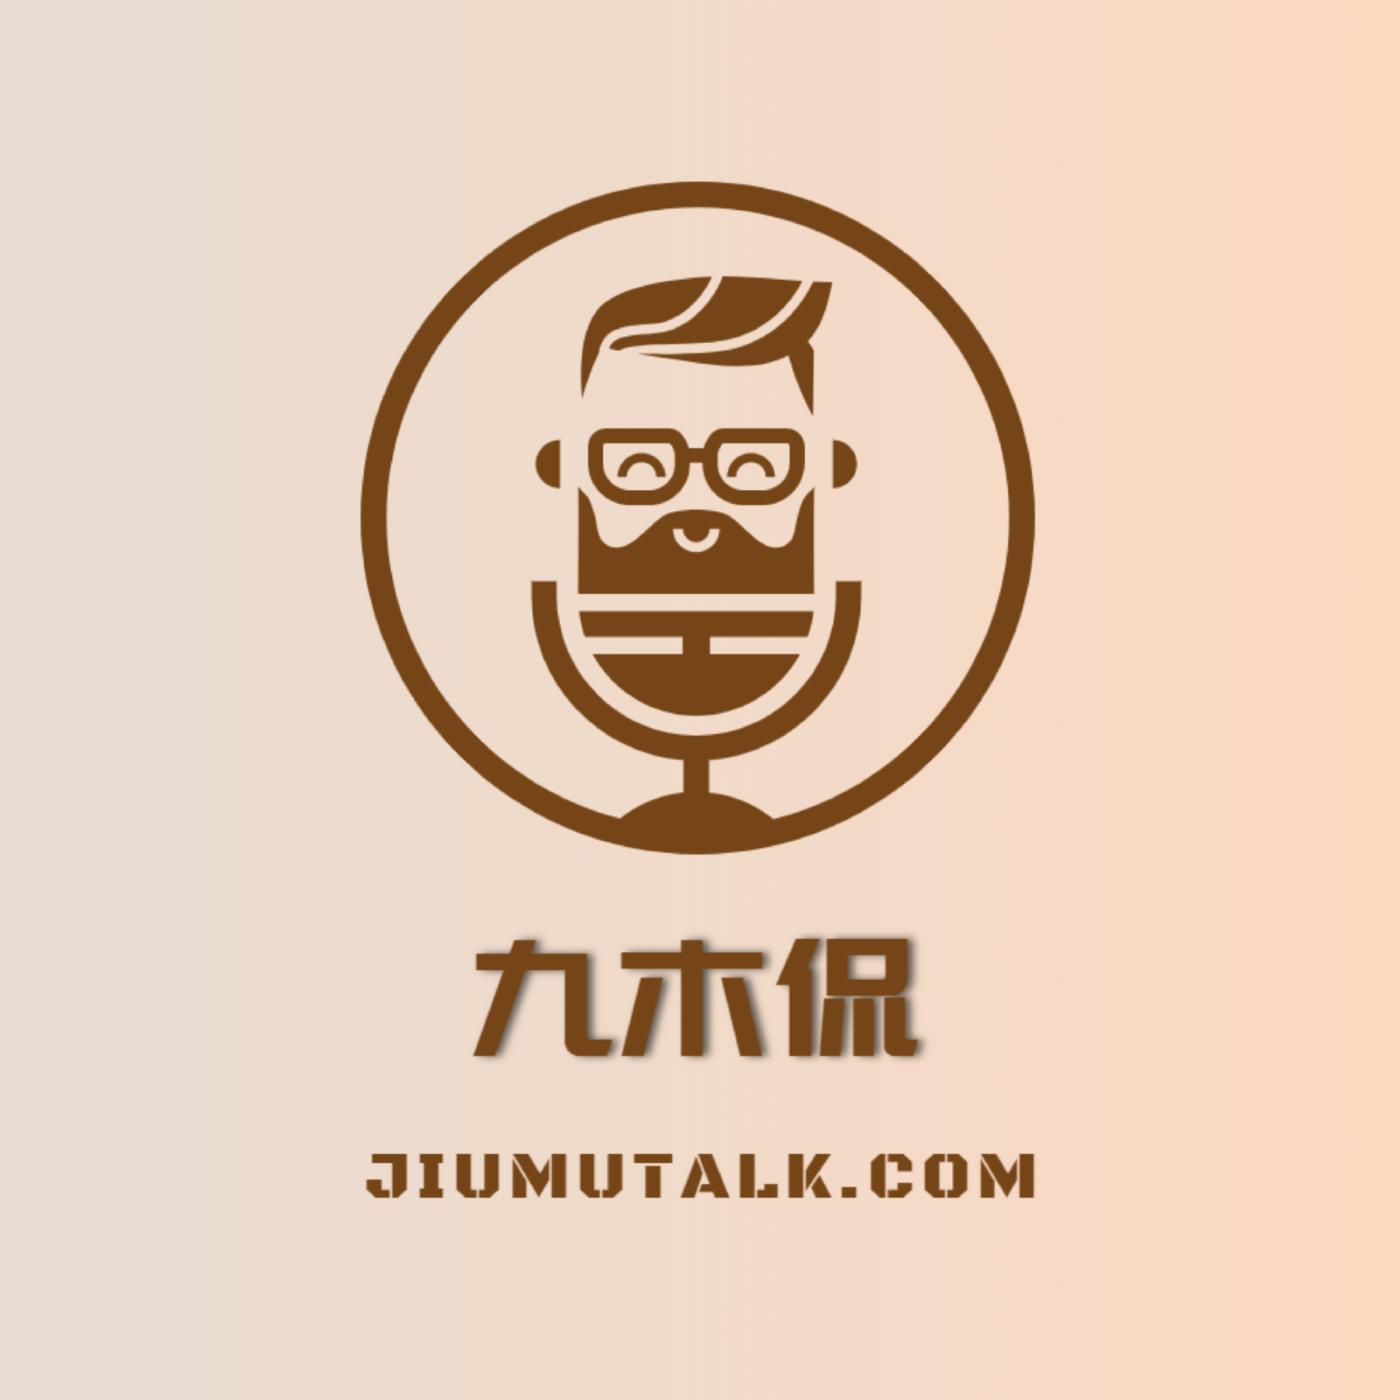 九木侃 Logo